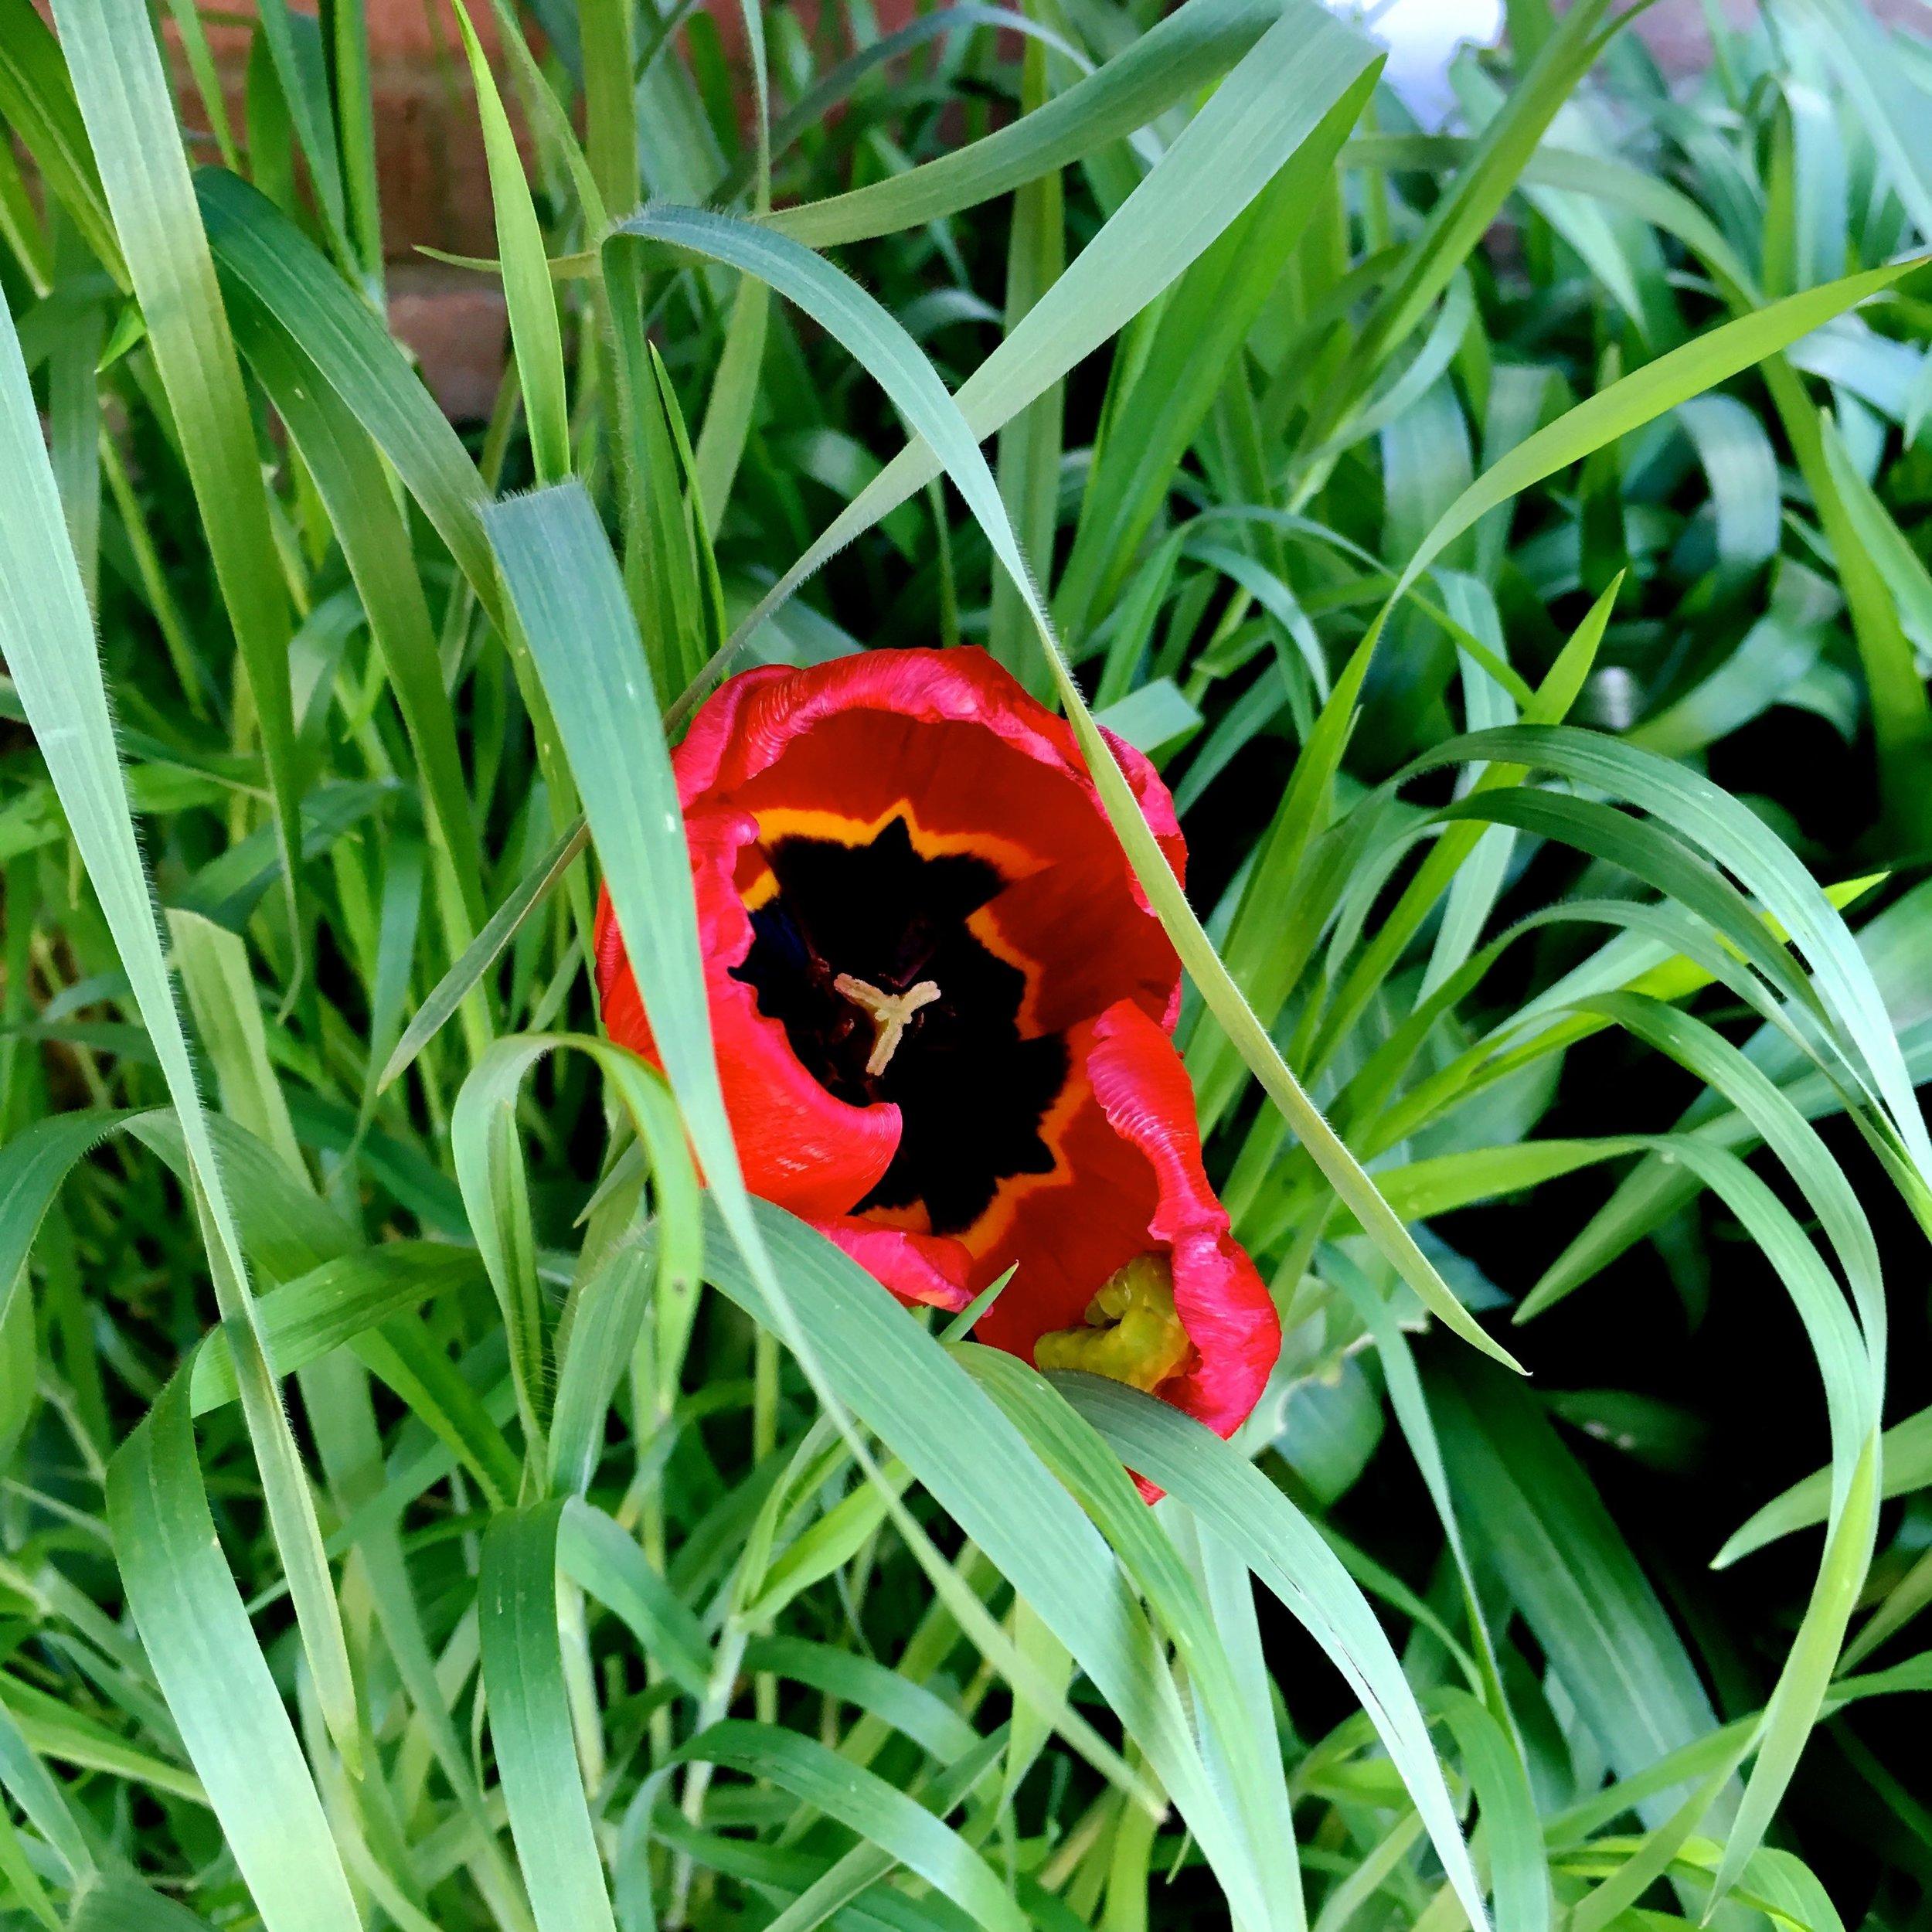 Peering into the dark centre of the tulip